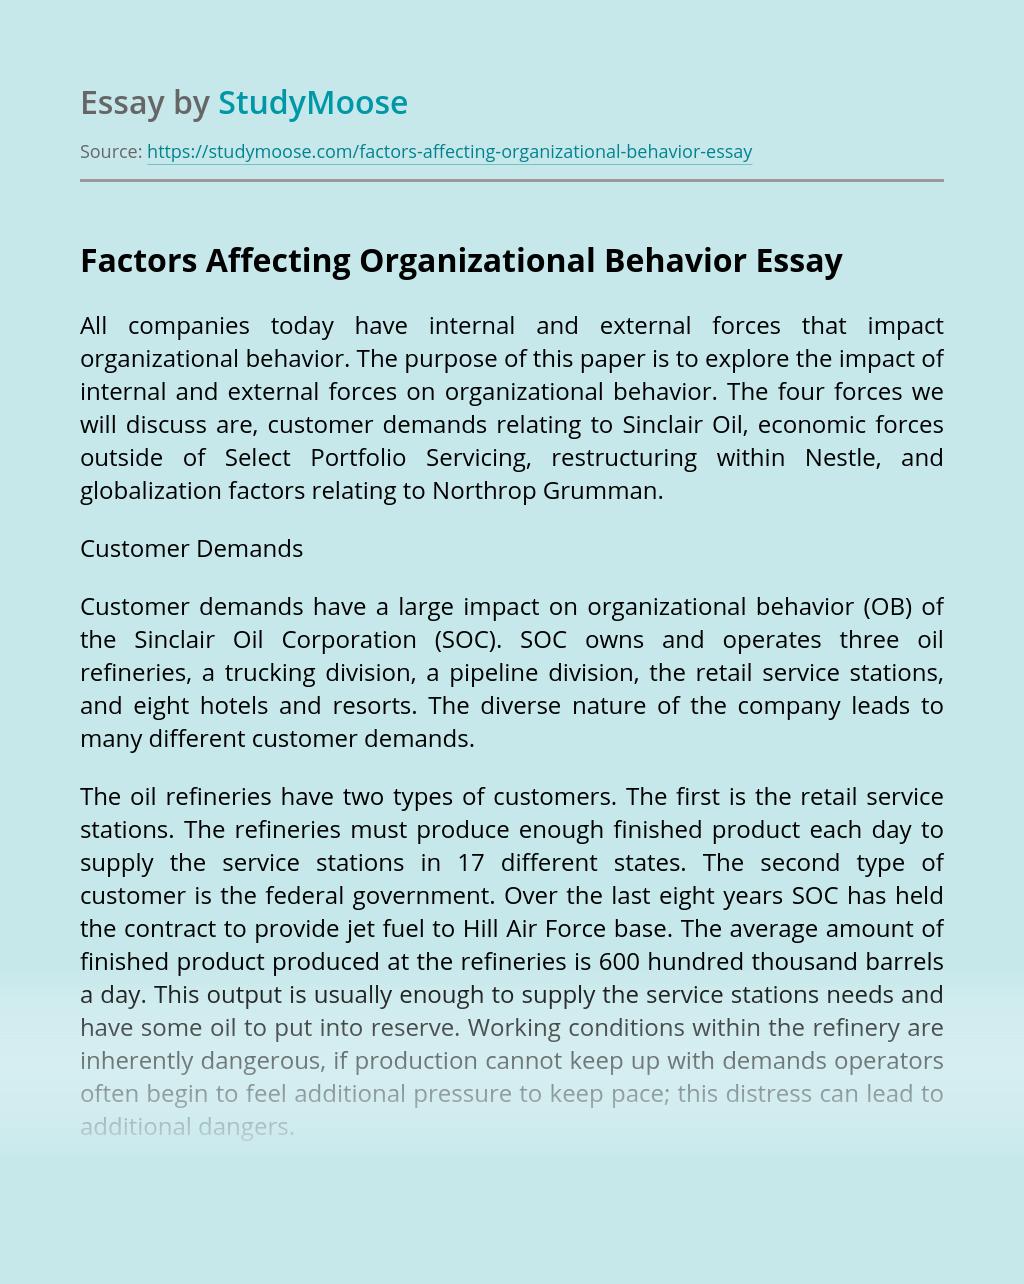 Factors Affecting Organizational Behavior